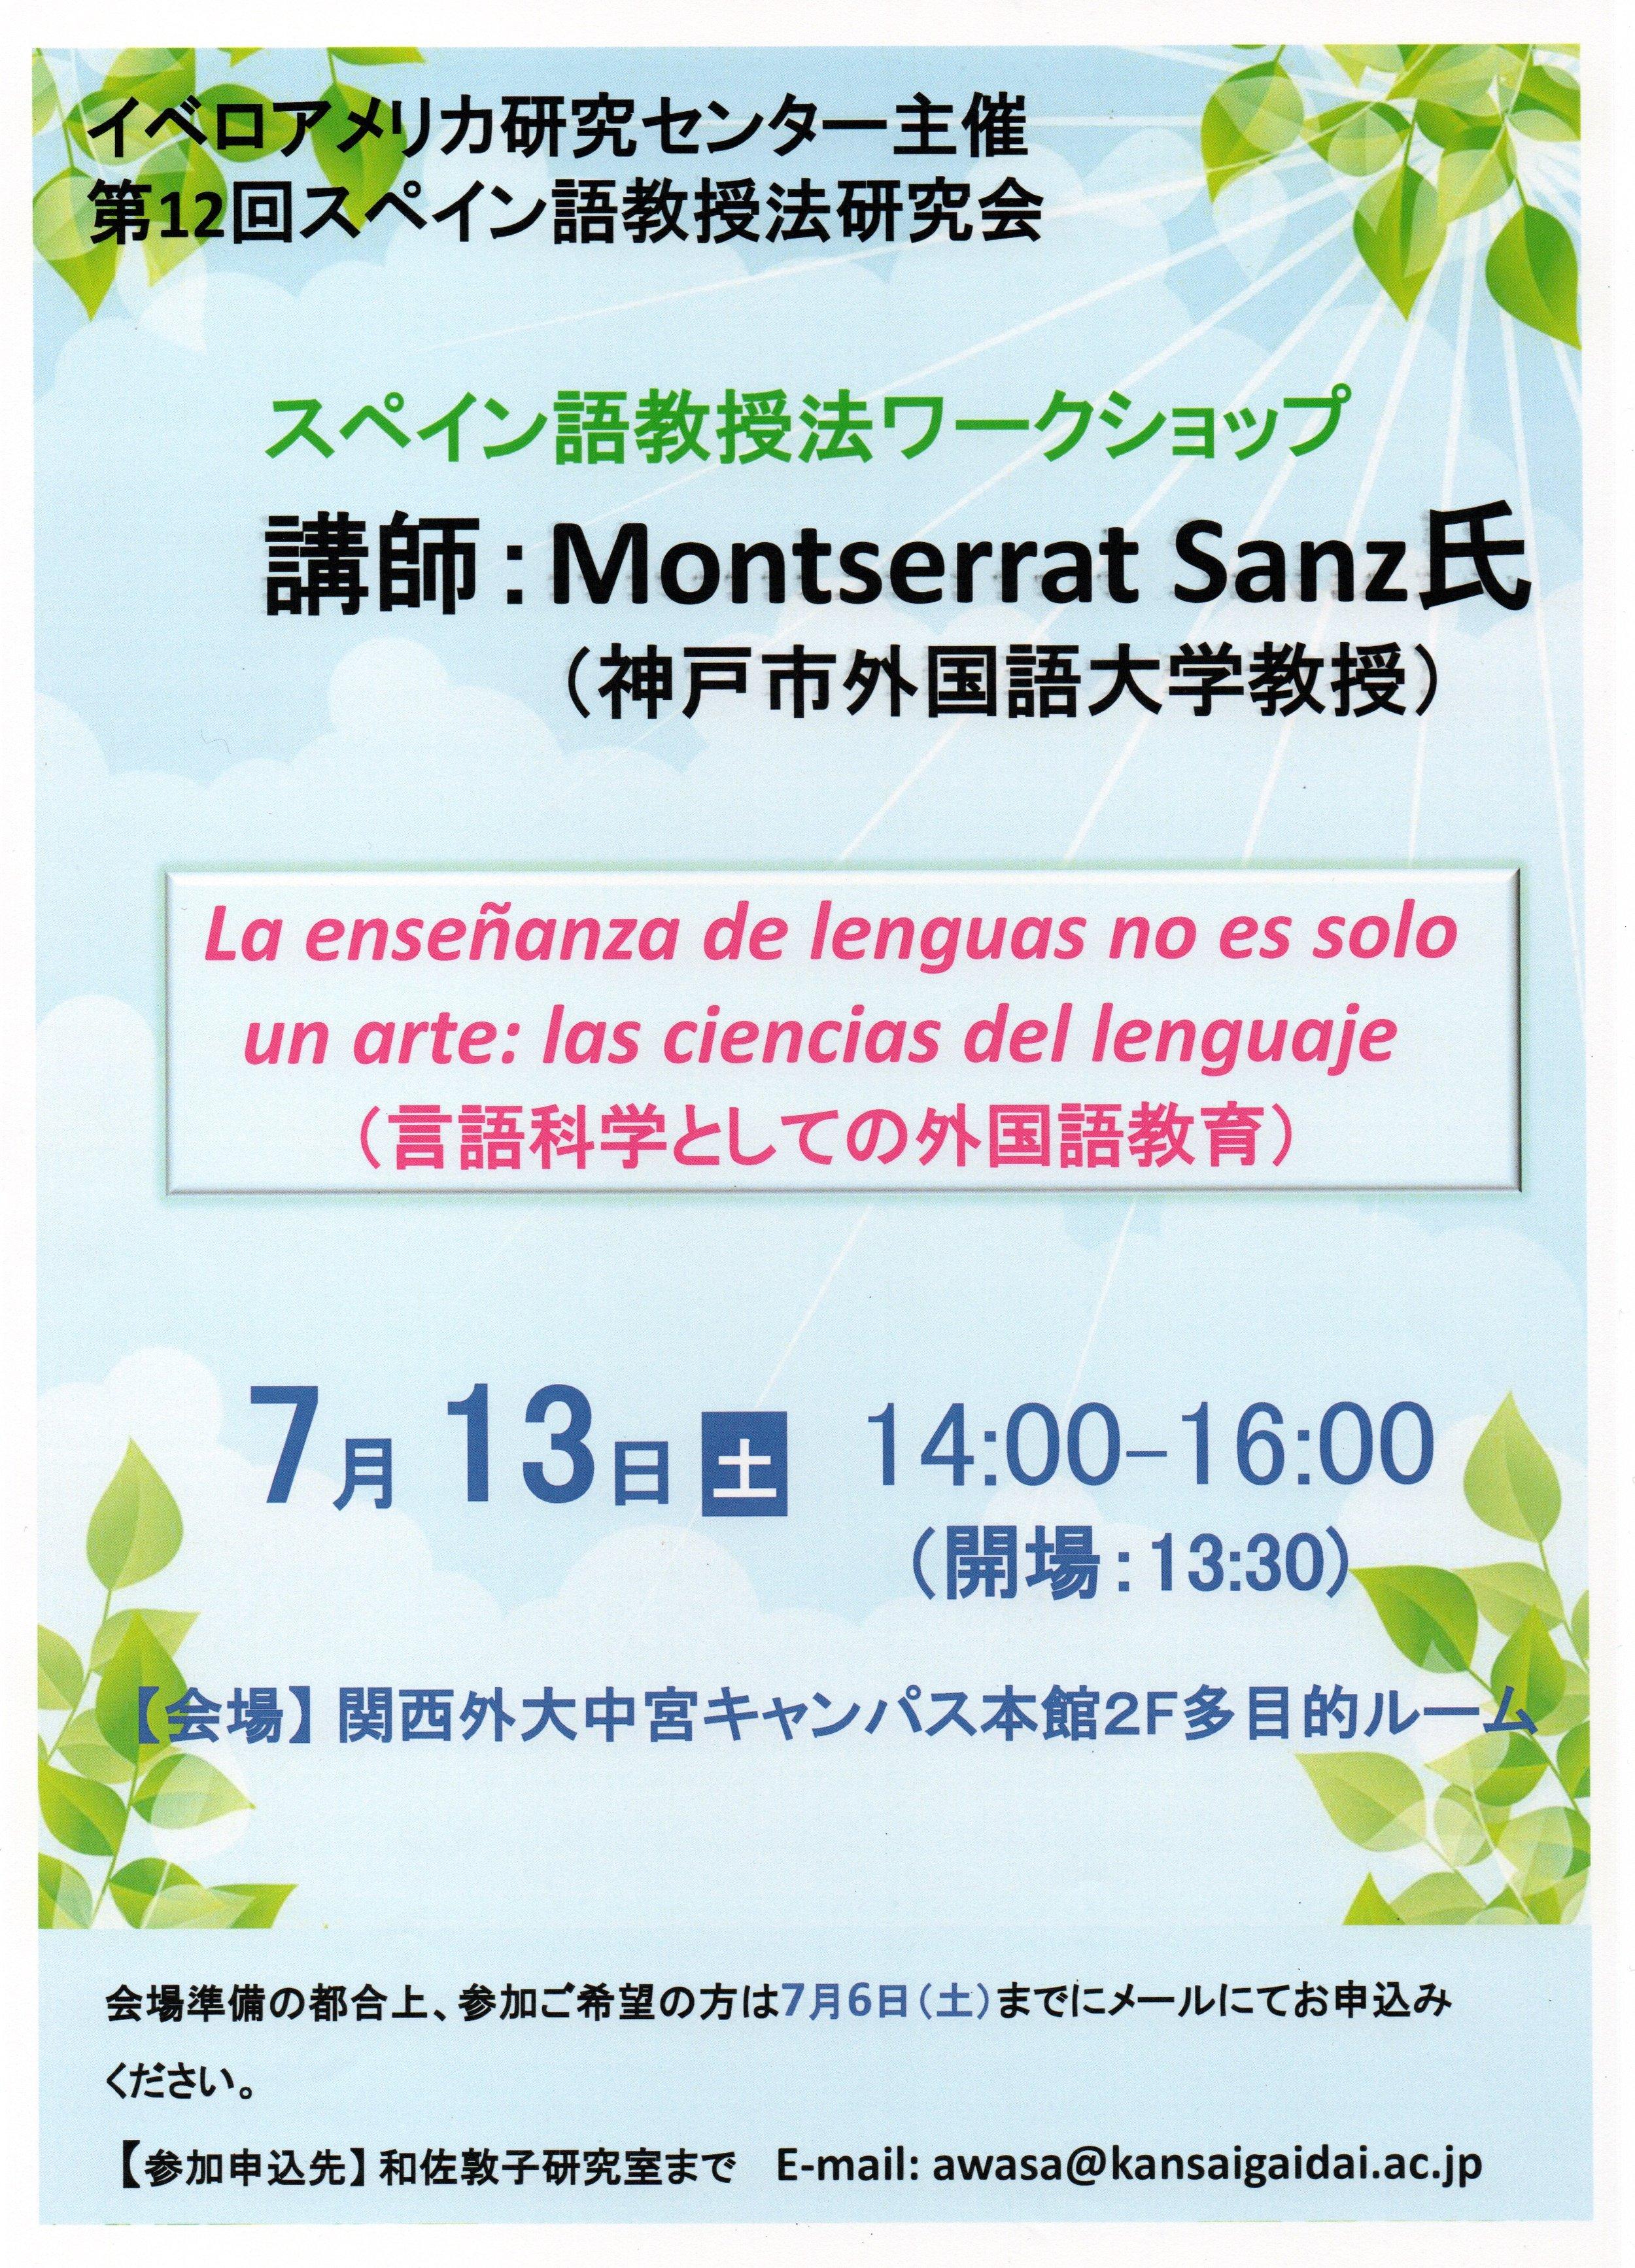 Workshop Sanz July 2019.jpeg